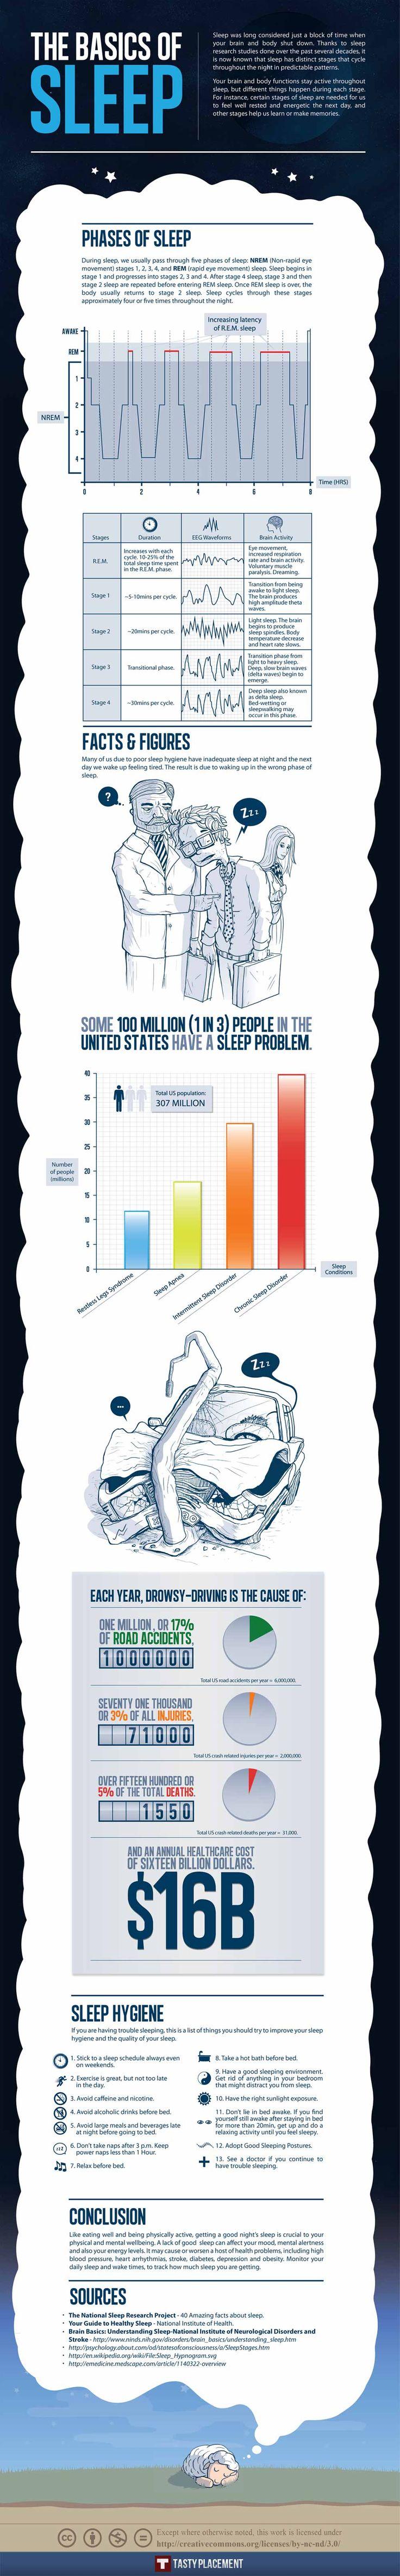 The Basics of Sleep [Infographic]